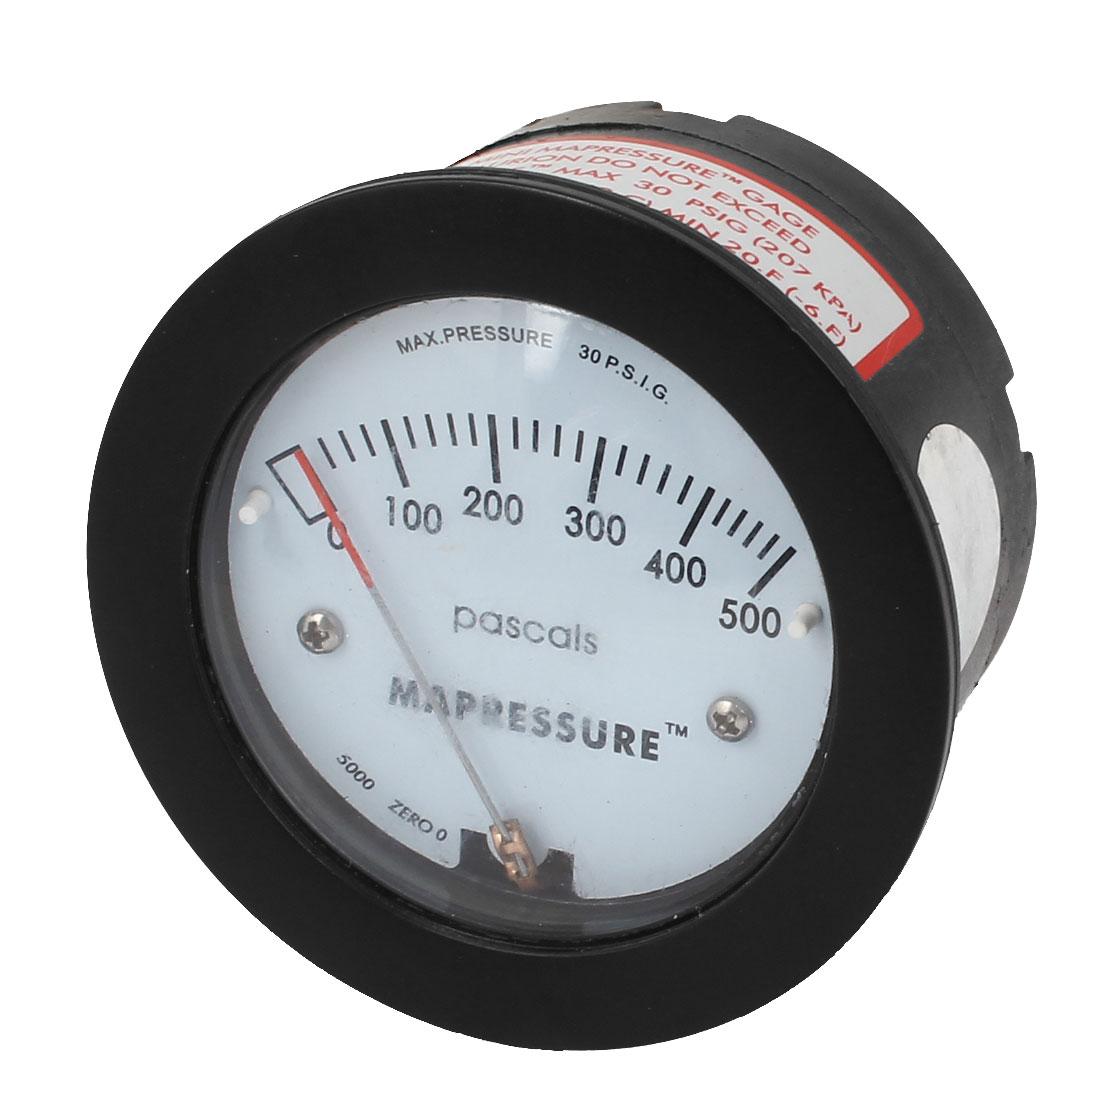 Adjustable Air Differential Pressure Gauge 0-500Pa